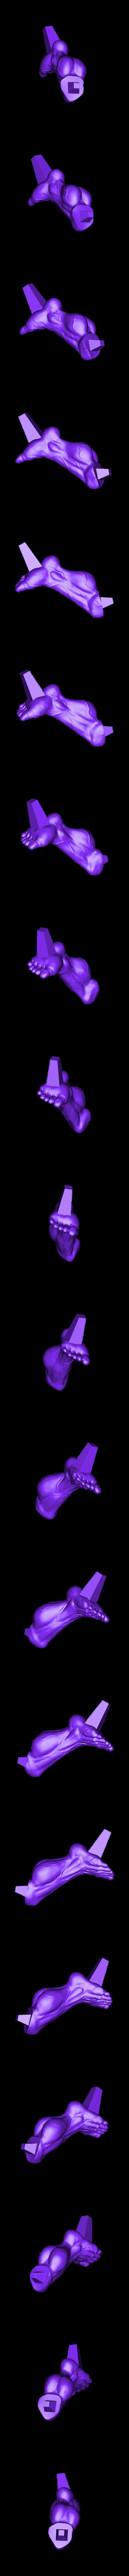 Lleg_300mm.stl Download STL file Hulk Angry - Super Hero - Marvel 3D print model • 3D print model, Bstar3Dart